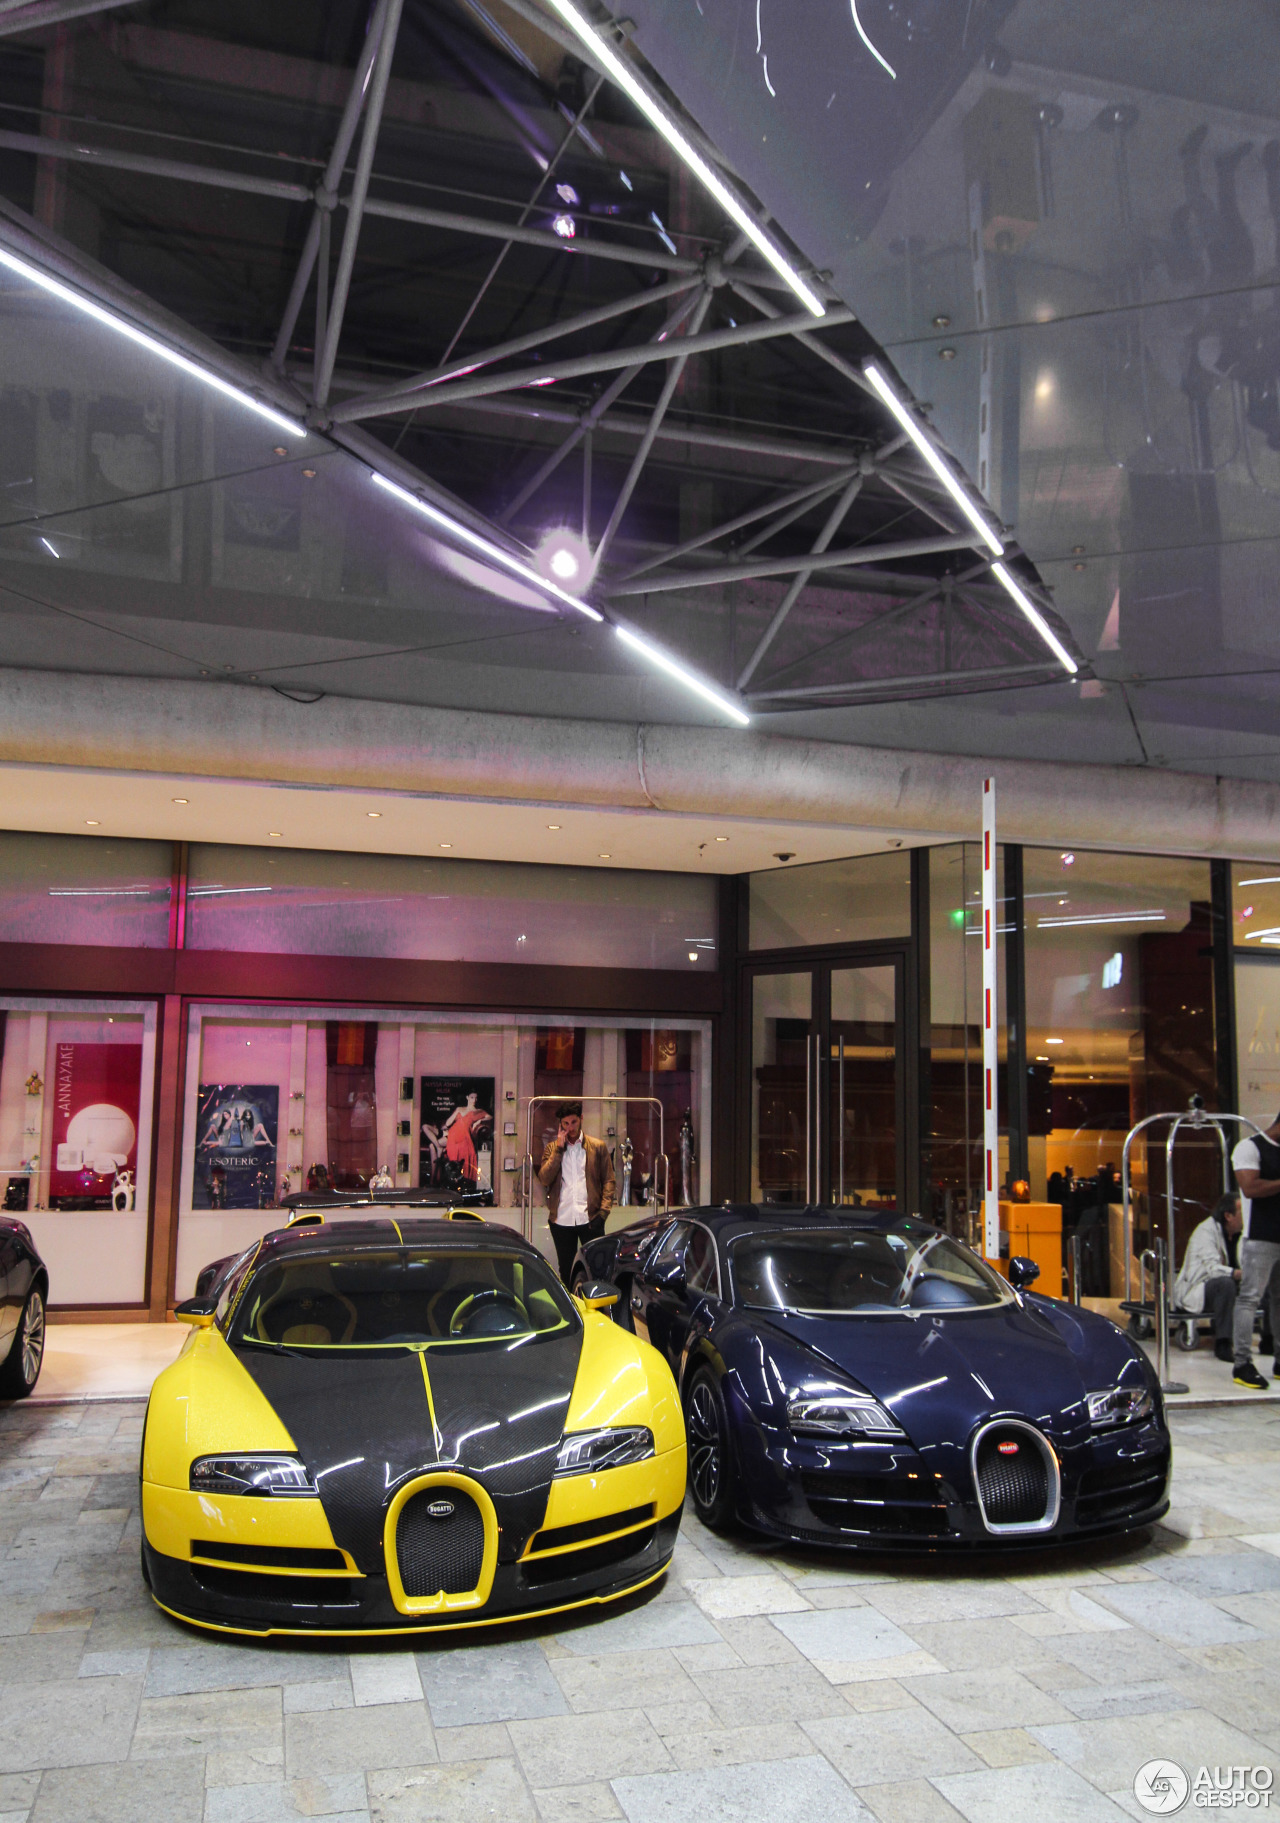 bugatti-veyron-164-super-sport-c528727012017000234_5 Stunning Bugatti Veyron Super Sport White Cars Trend